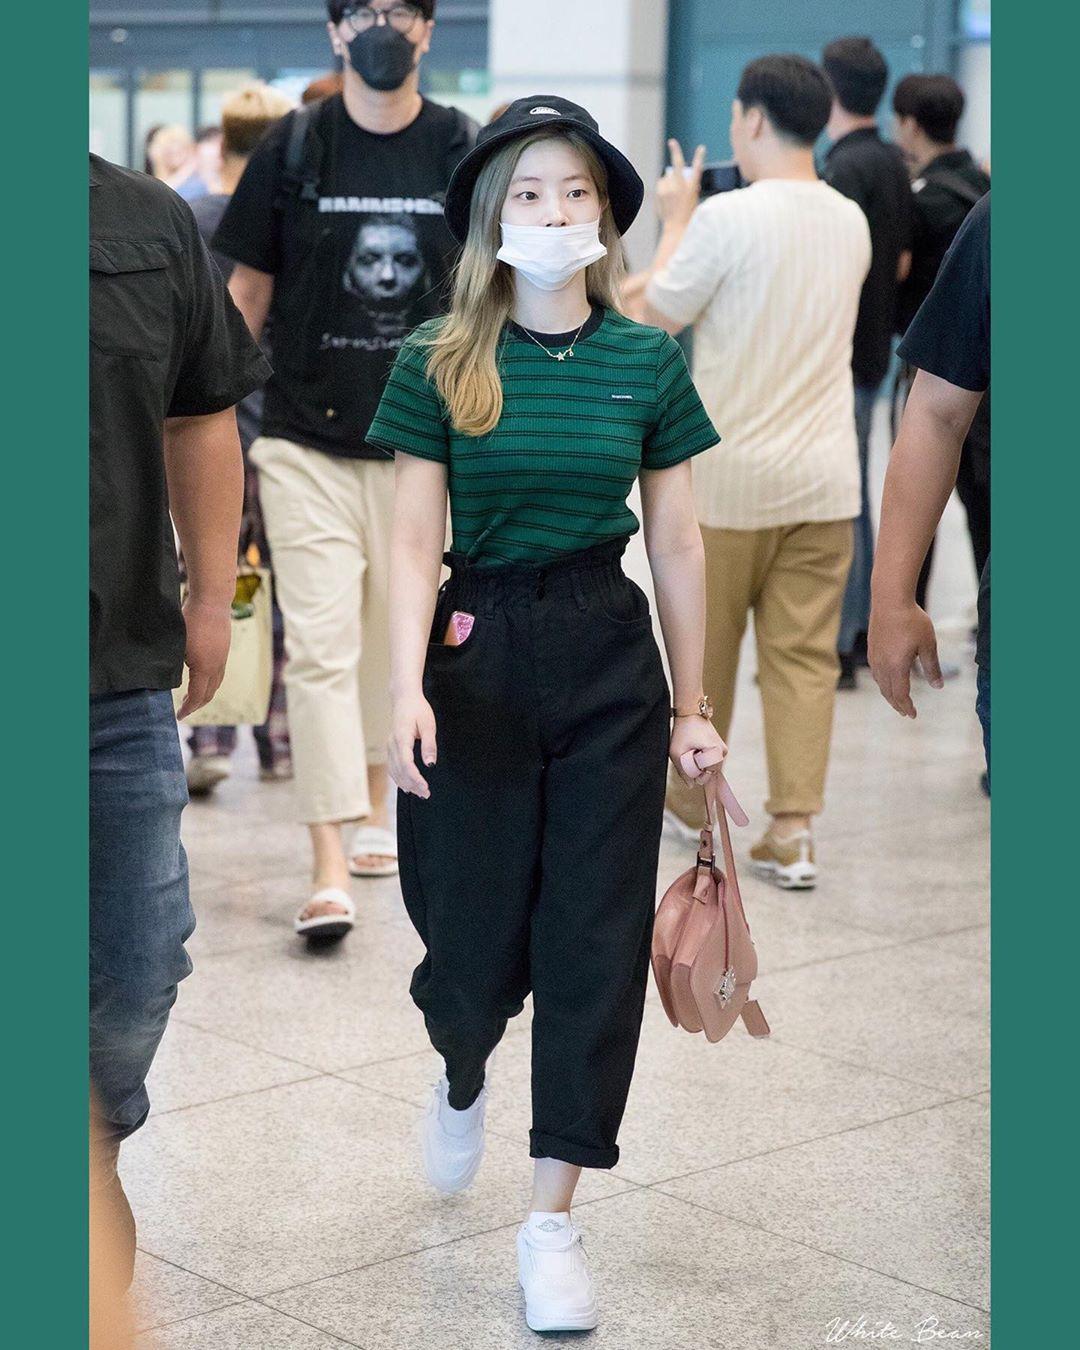 Resultats Google Recherche D Images Correspondant A Https Scontent Atl3 1 Cdninstagram Com V Korean Airport Fashion Kpop Fashion Outfits Airport Fashion Kpop